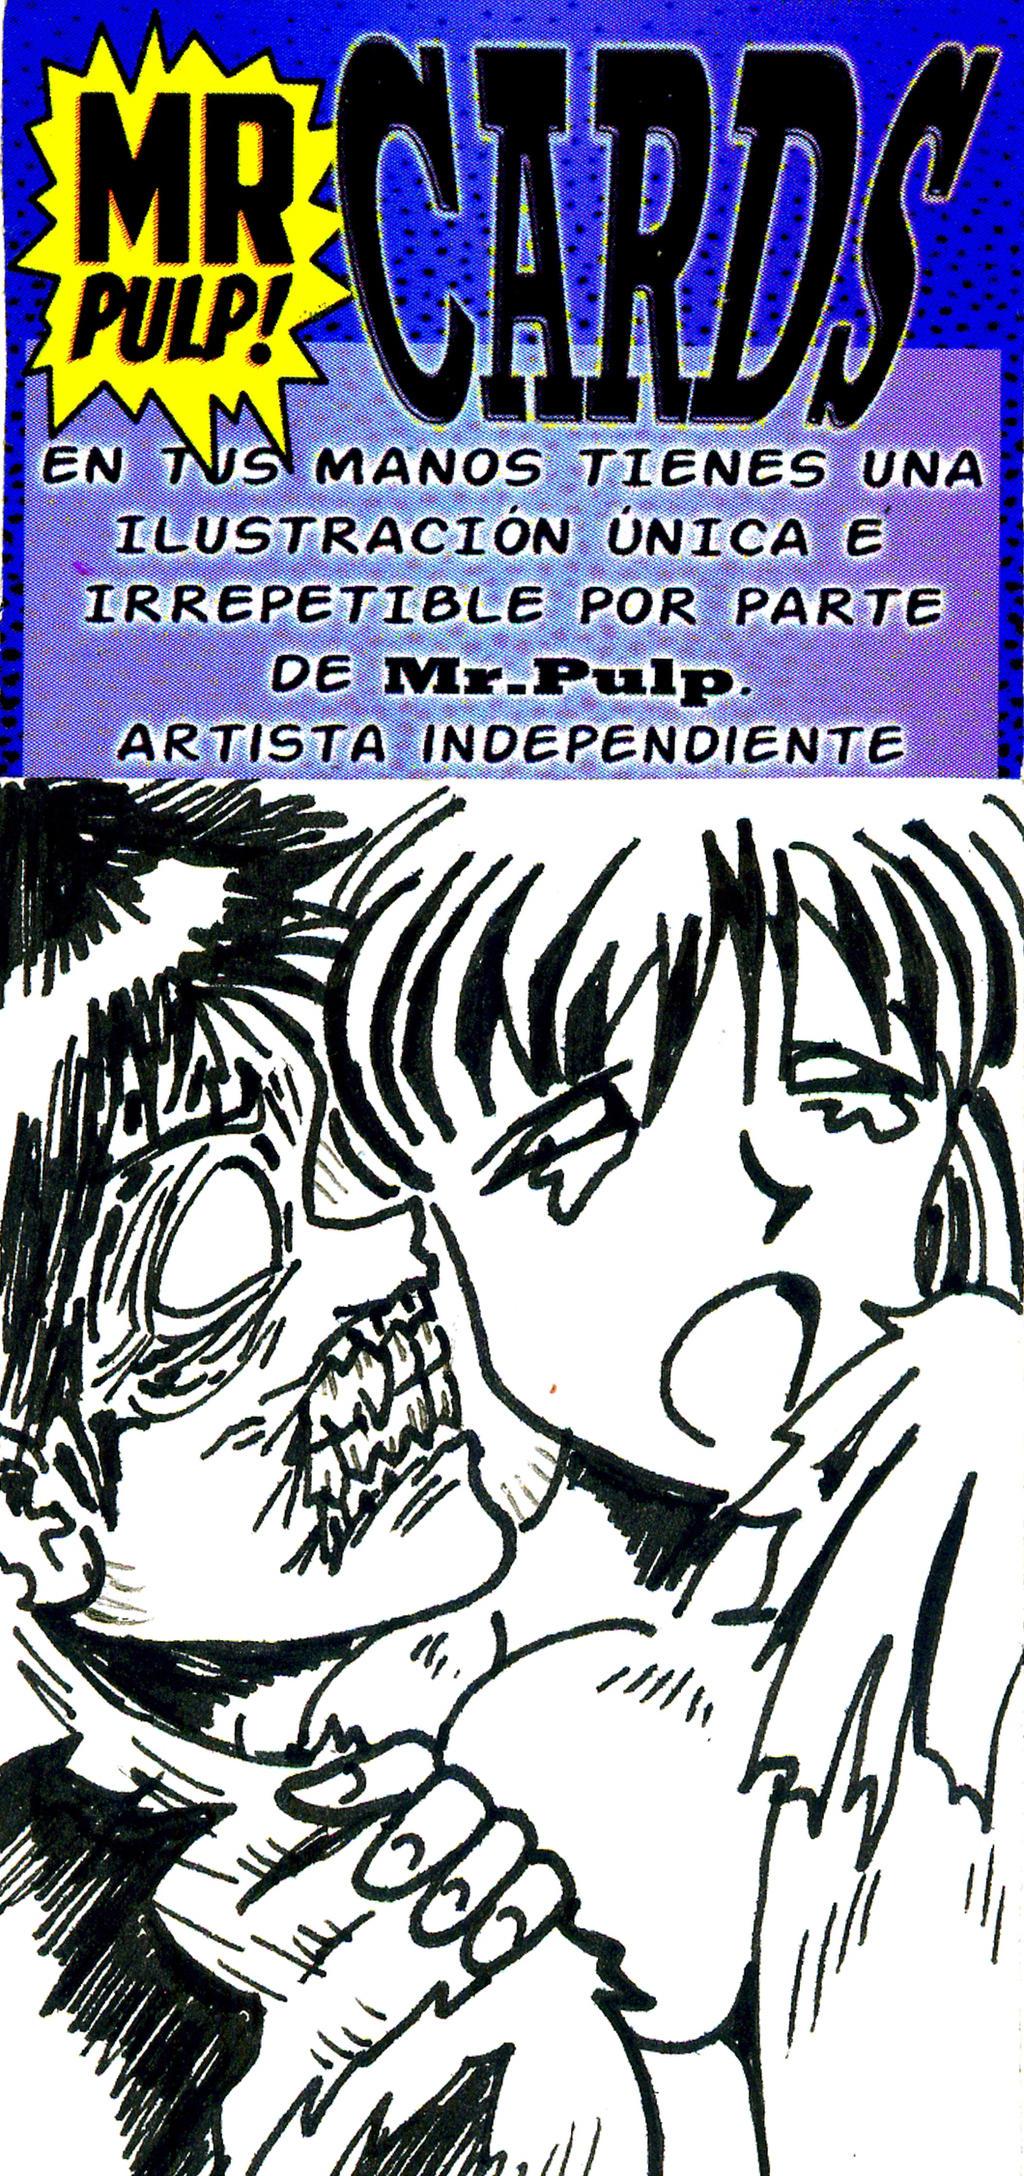 Inktober017 by mrpulp-presenta